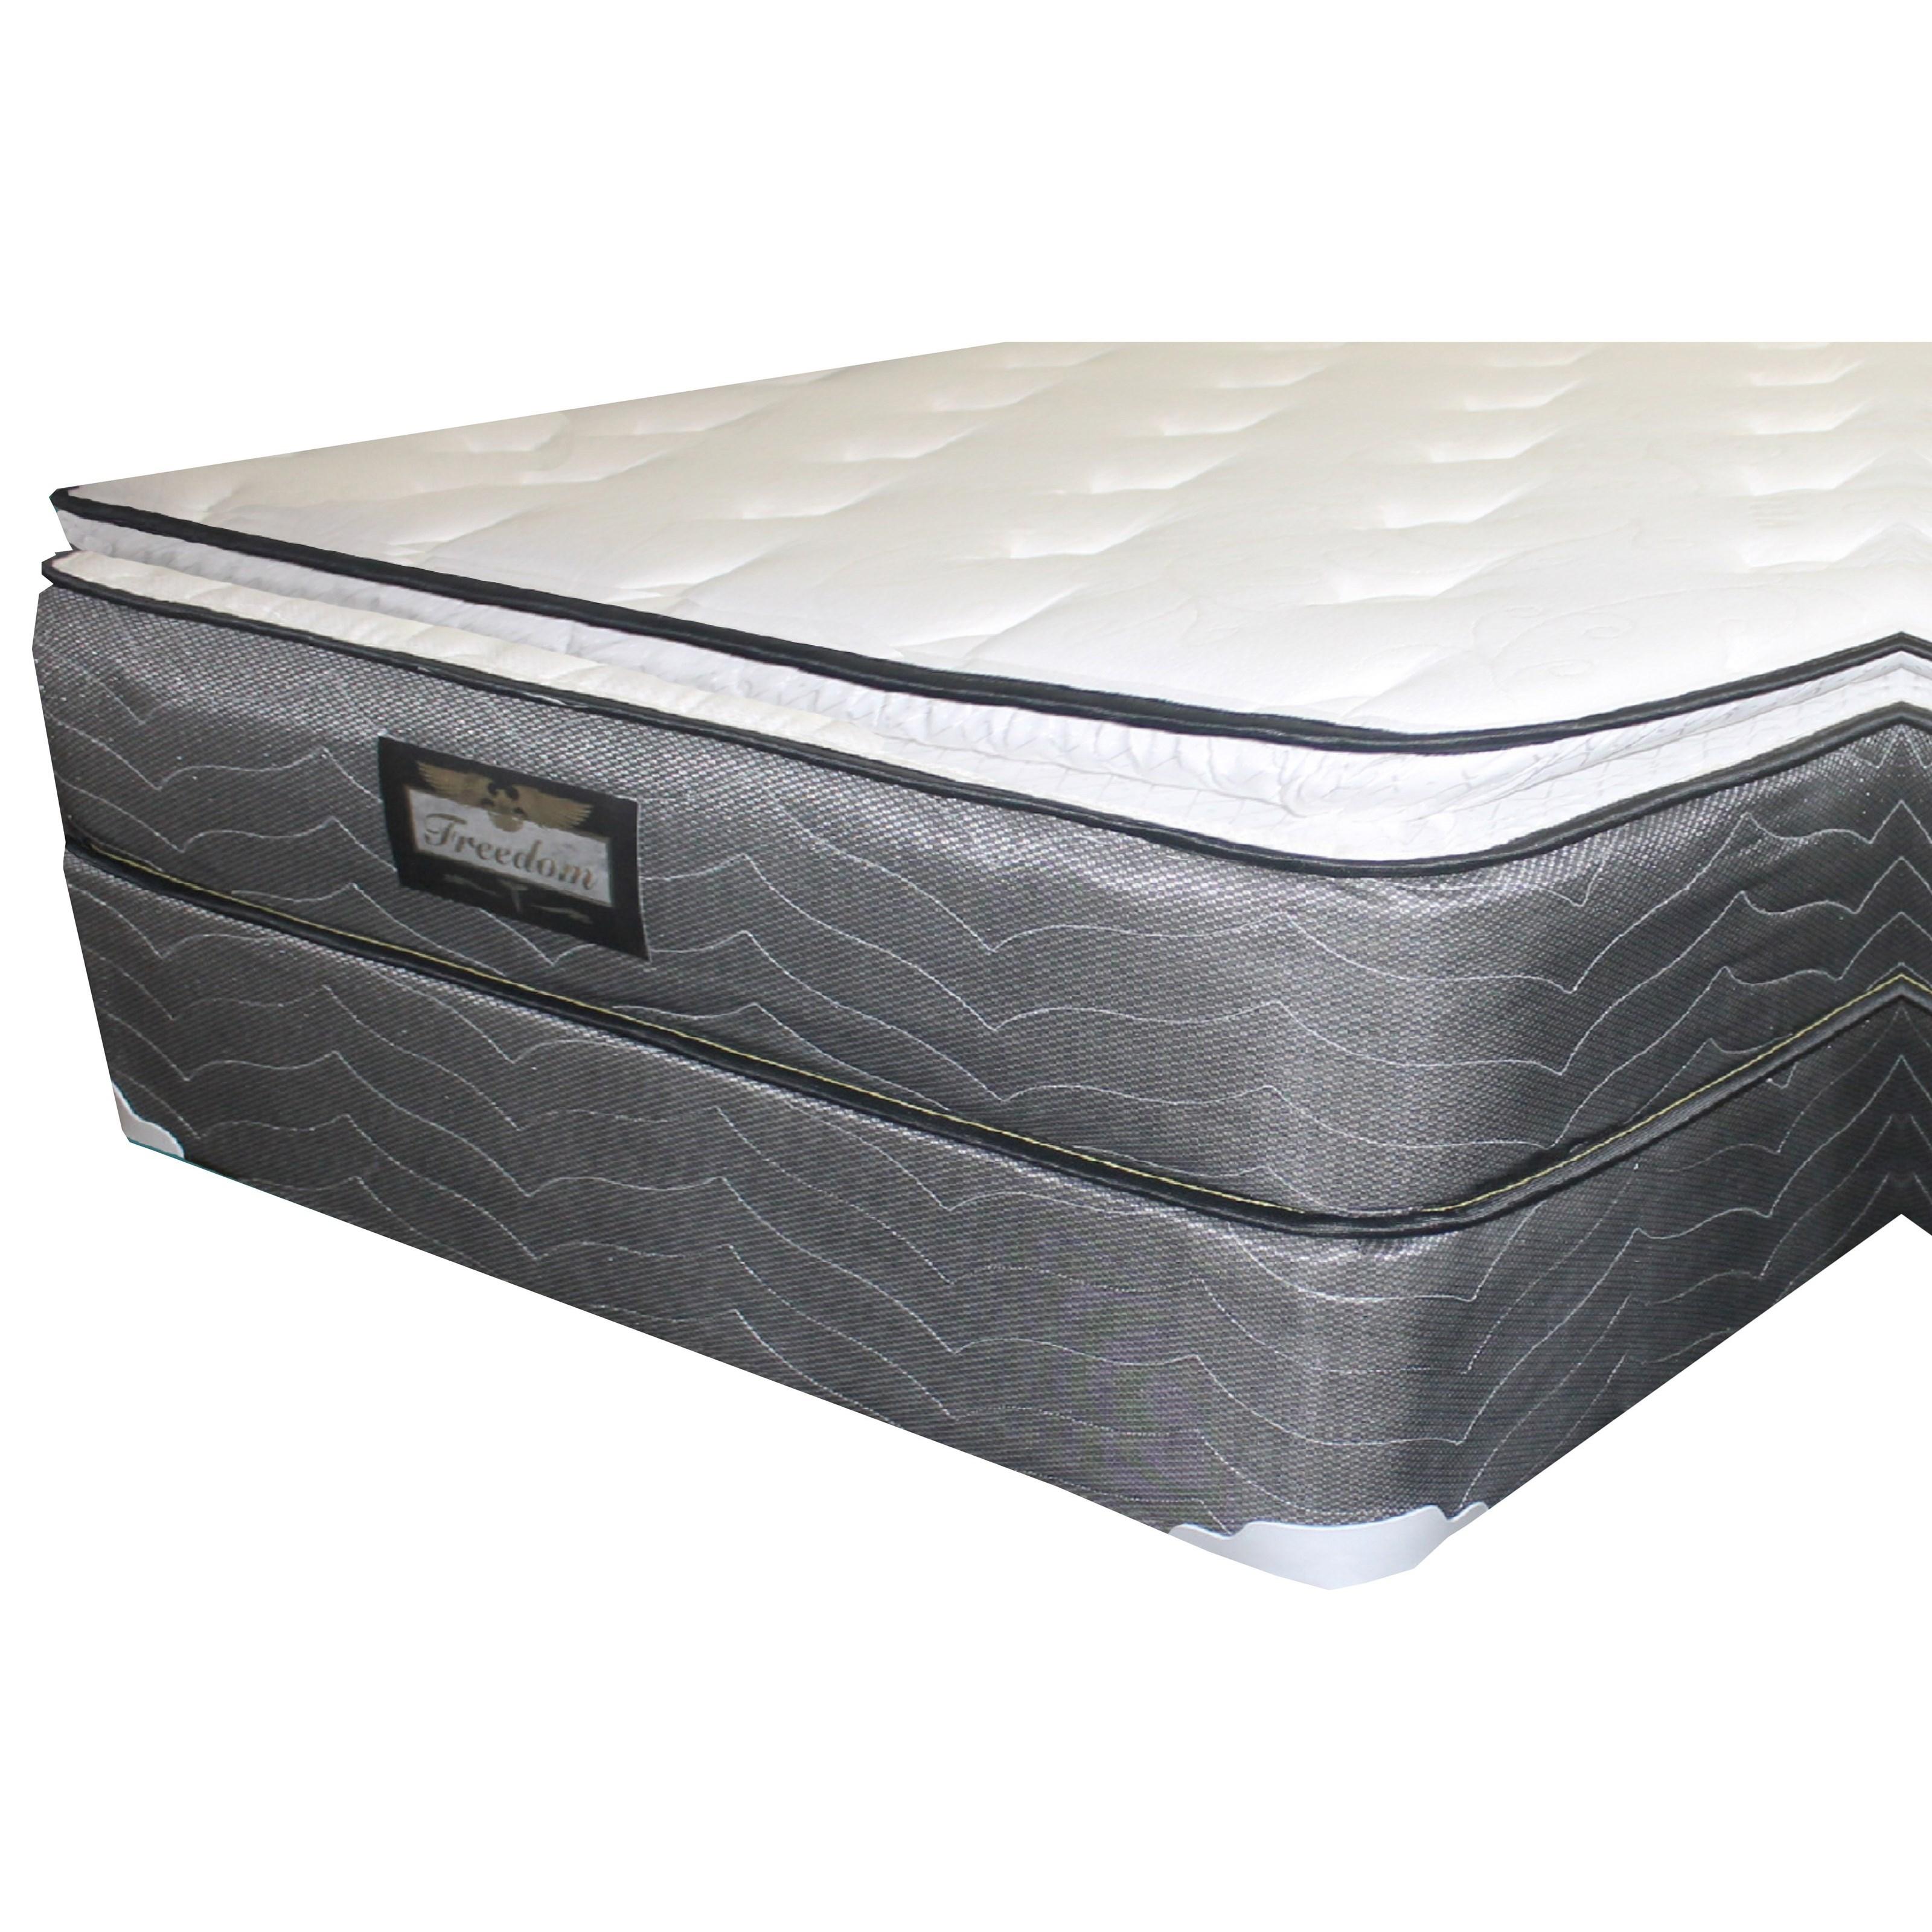 "Golden Mattress Company Freedom Foam Encased PT Queen 12"" Pillow Top Mattress Set - Item Number: Pillowtop-Q+Woodfndtn-Q"